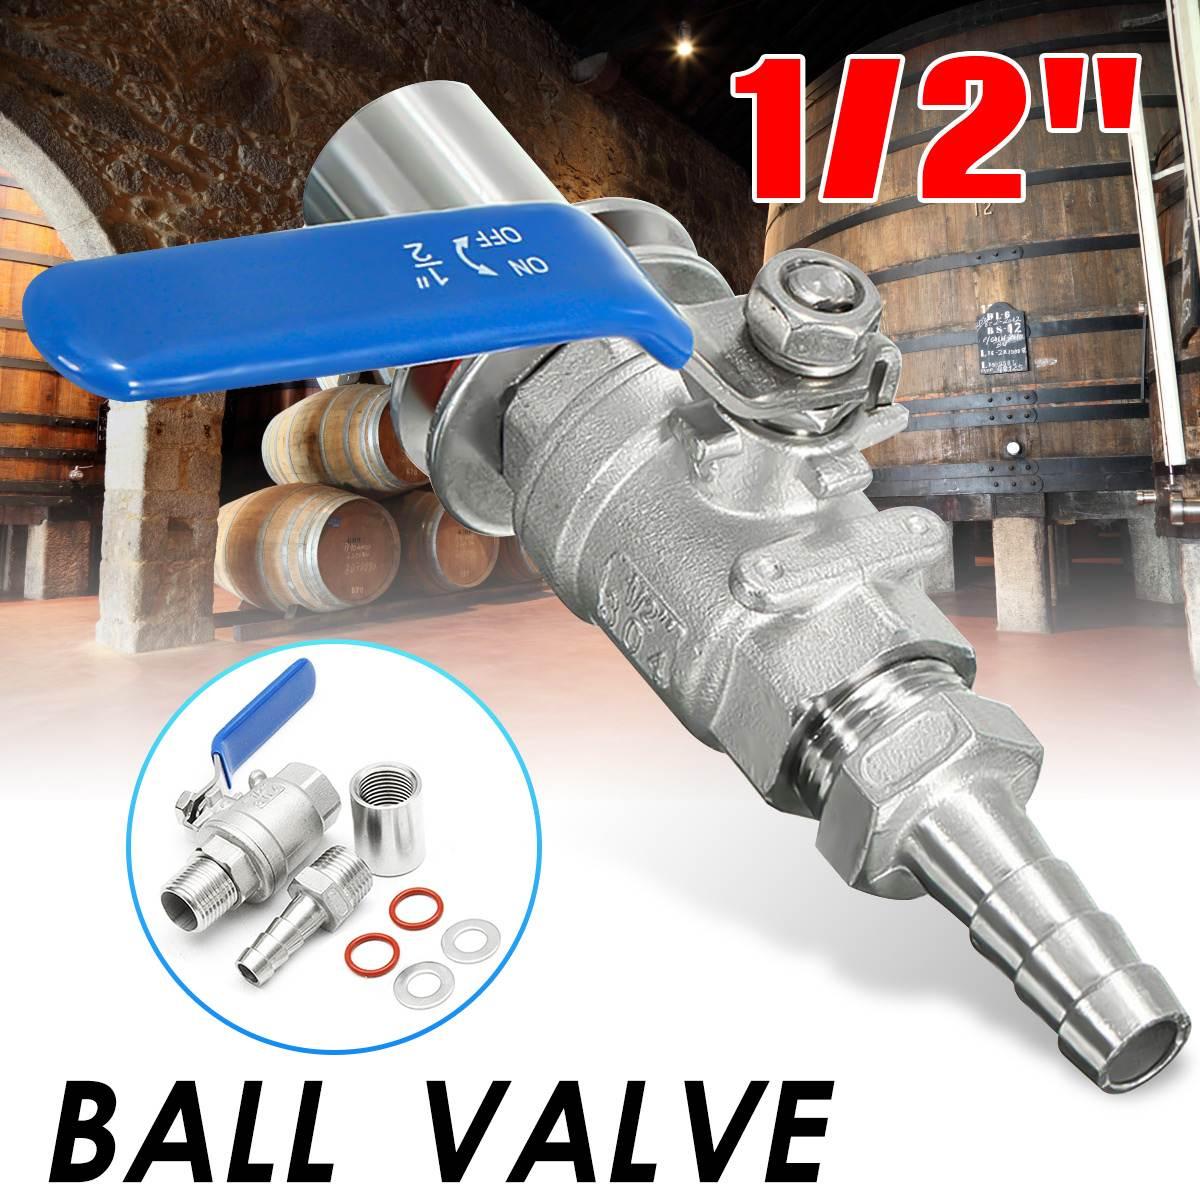 304 Stainless SteelL Shape Ball Valve 1//2 Weldless Bulkhead 1000psi for Brew Kettle Drain Port and Mash Tun